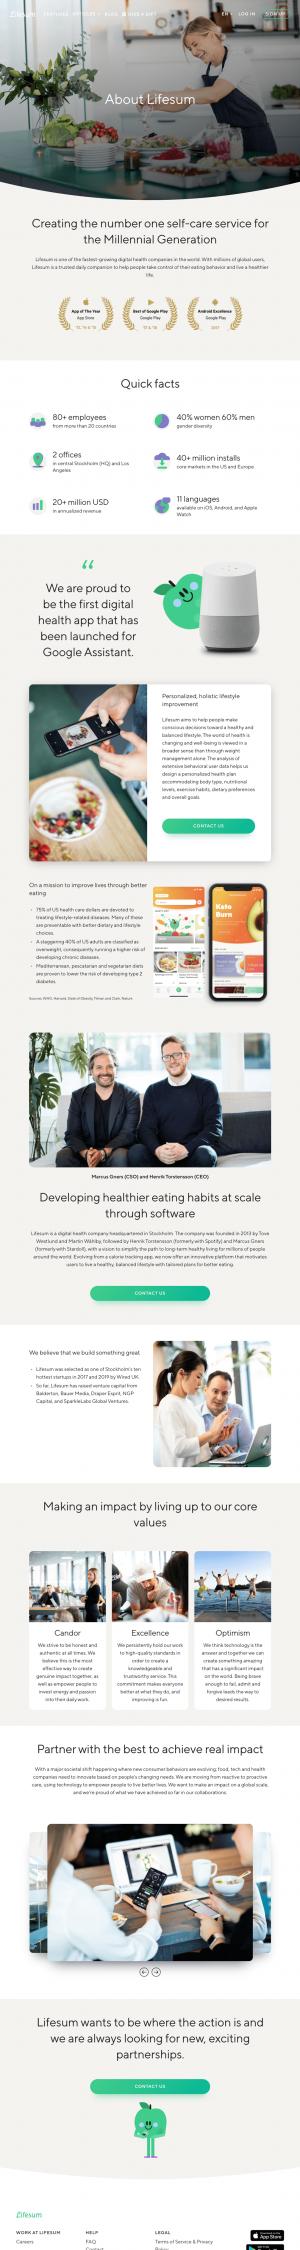 Lifesum – About Us page